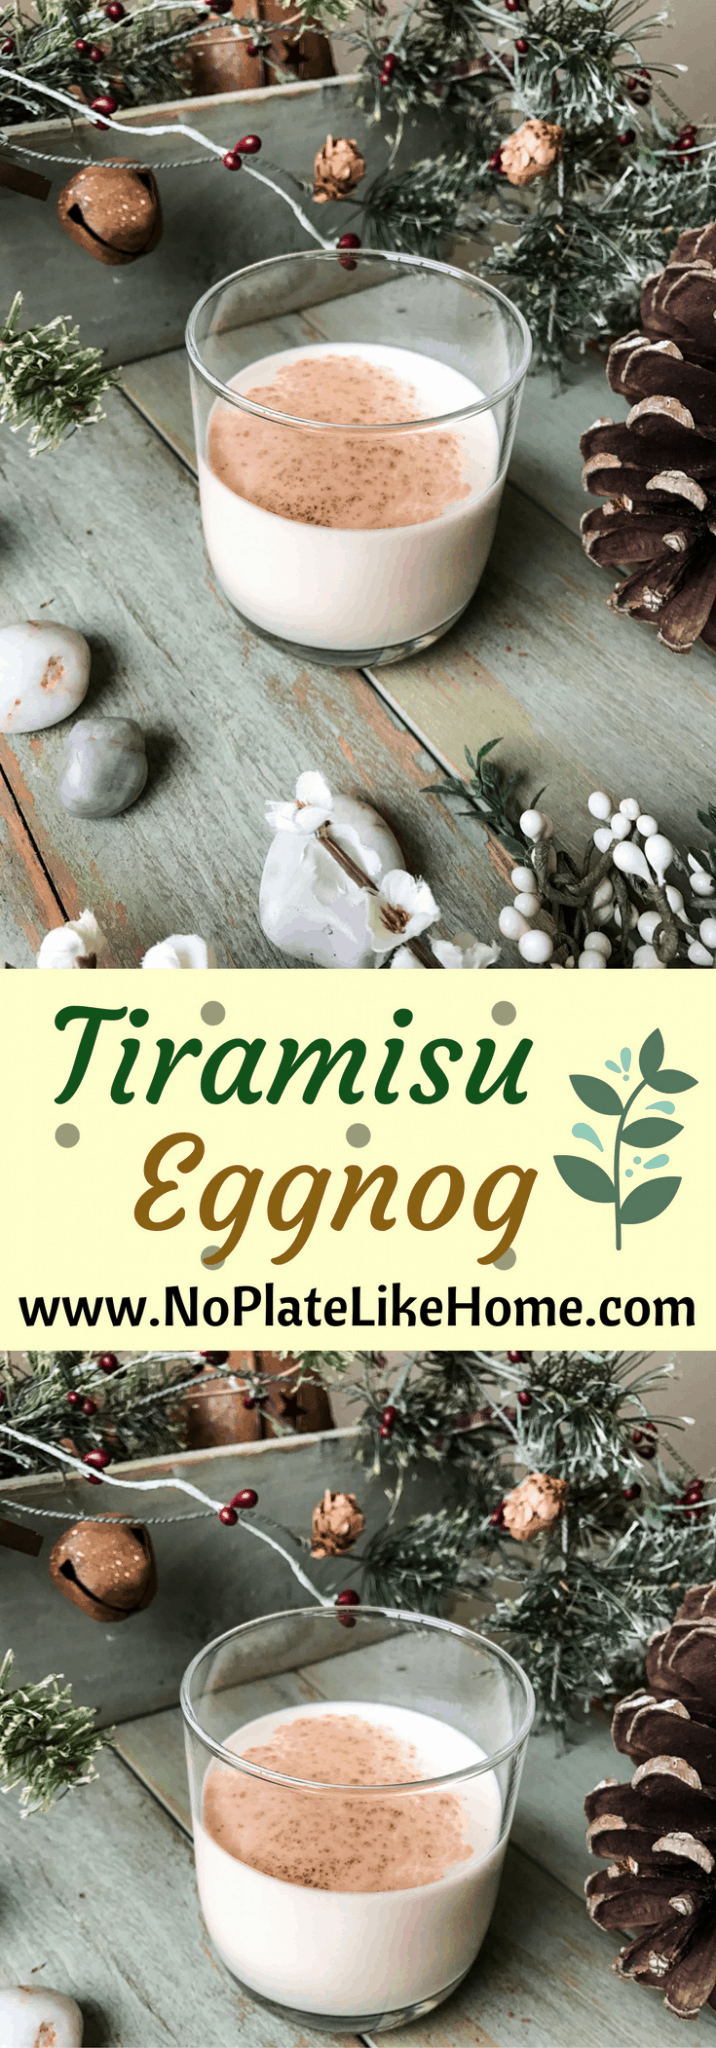 Tiramisu Eggnog Cocktail